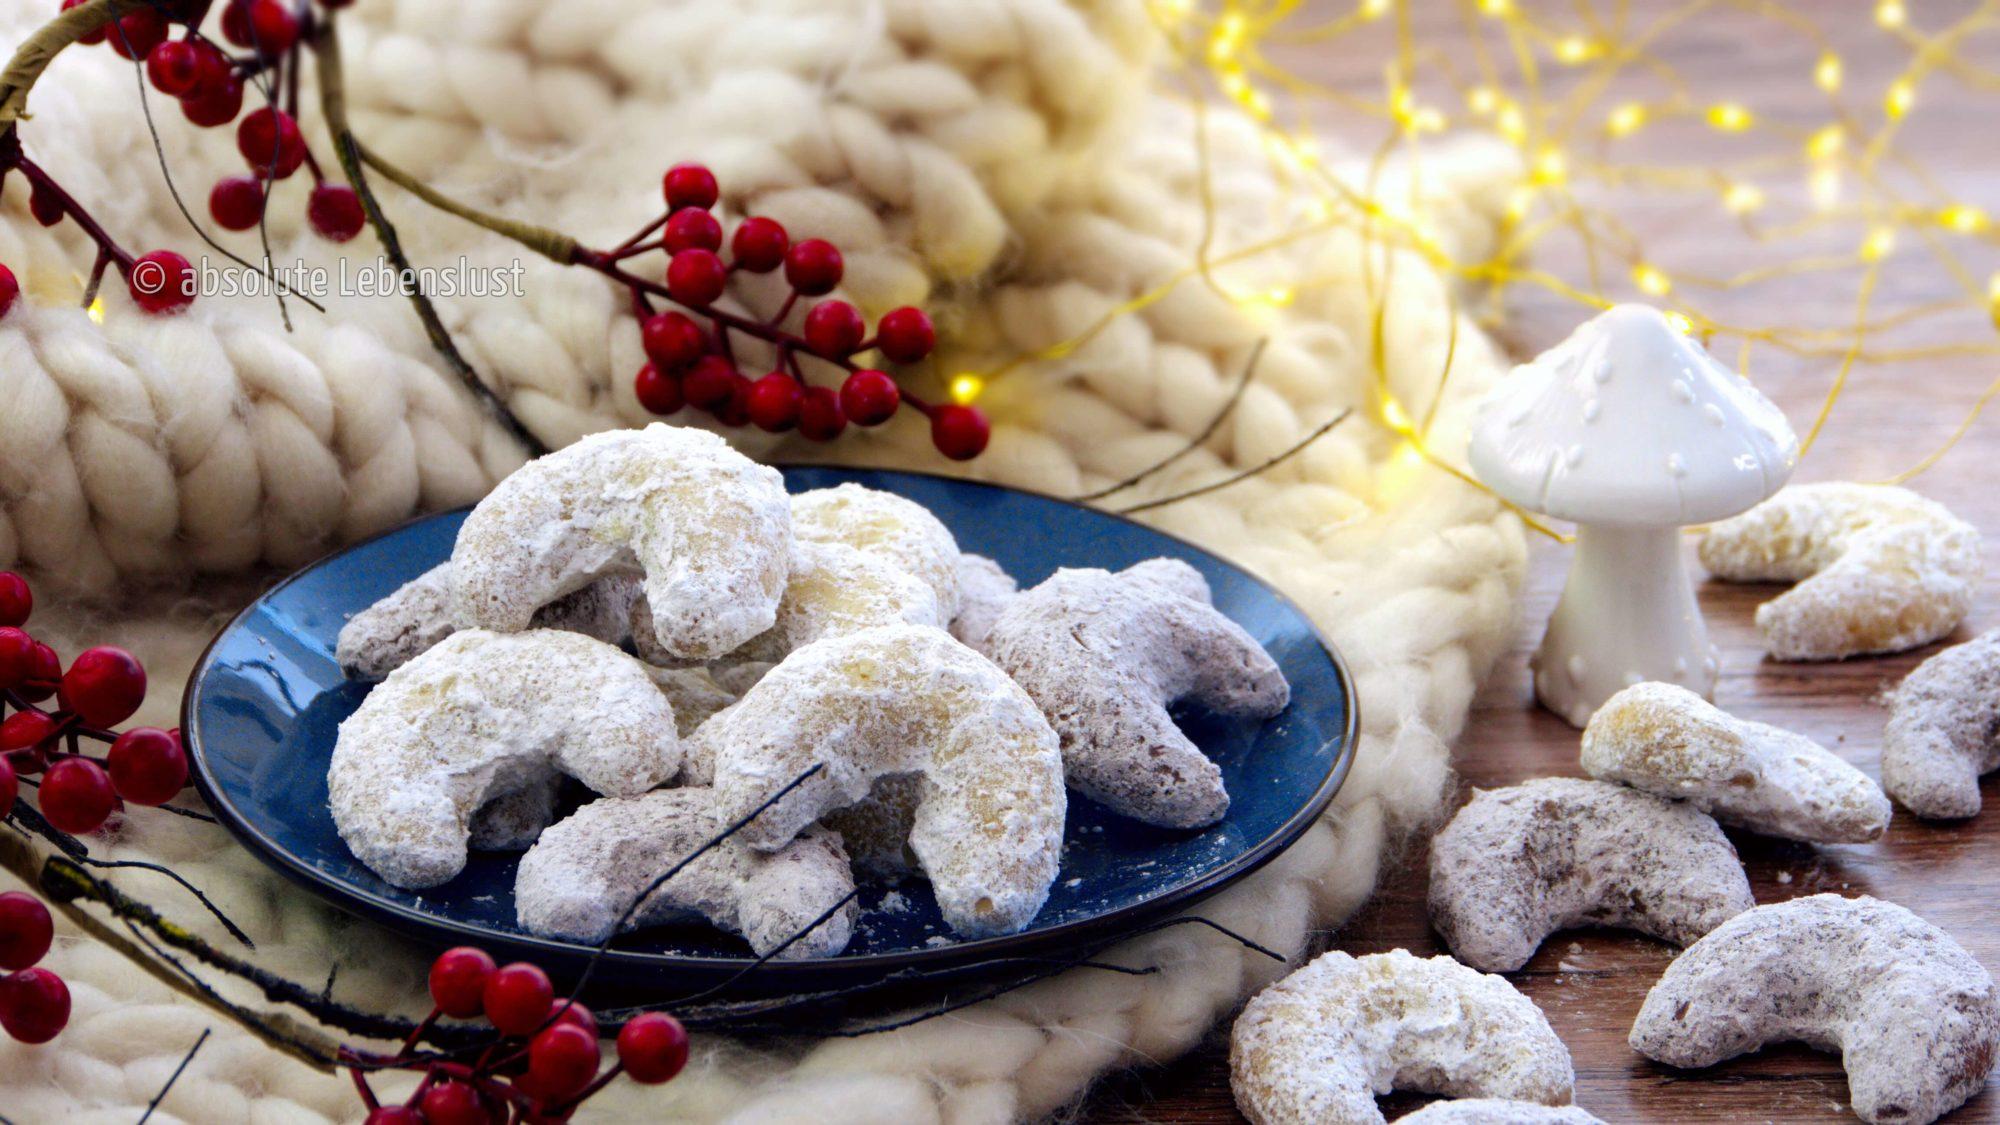 vanillekipferl, schokokipferl, grundrezept, plätzchenrezepte, plätzchen rezepte, weihnachtsplätzchen, backen, selber machen